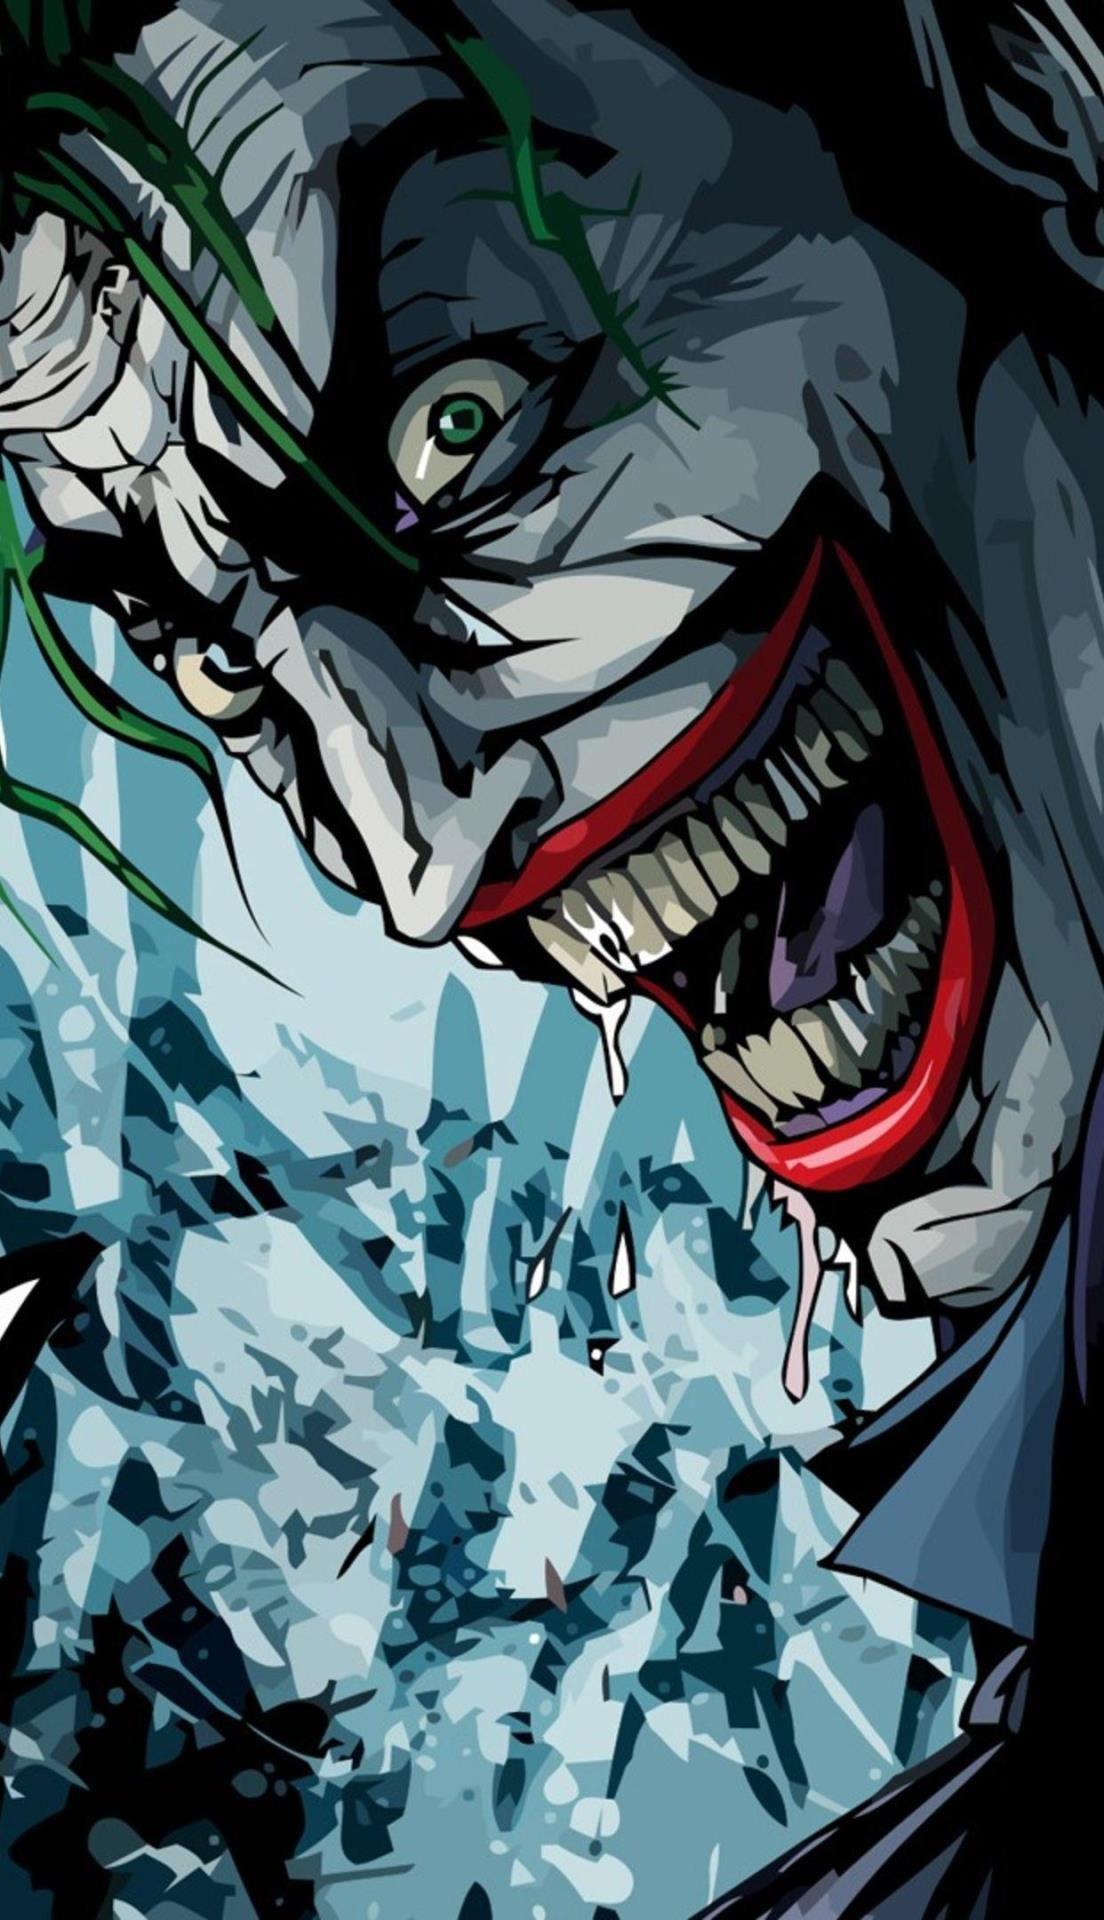 Joker Wallpapers In 2020 Joker Iphone Wallpaper Joker Wallpapers Joker Smile